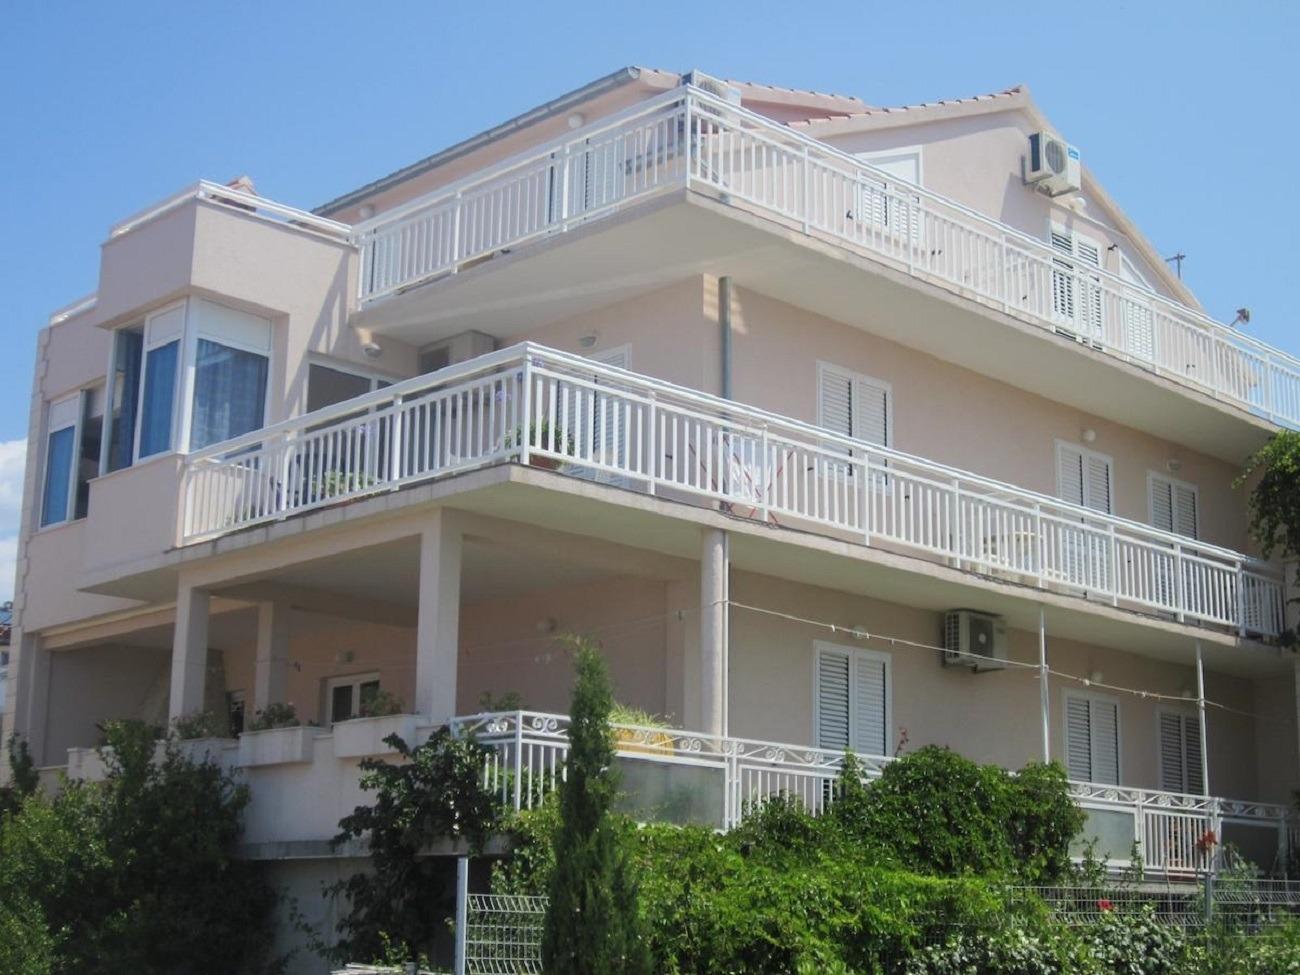 Apartments, Hvar, Island of Hvar - Apartments  Dar - 400 m from sea: